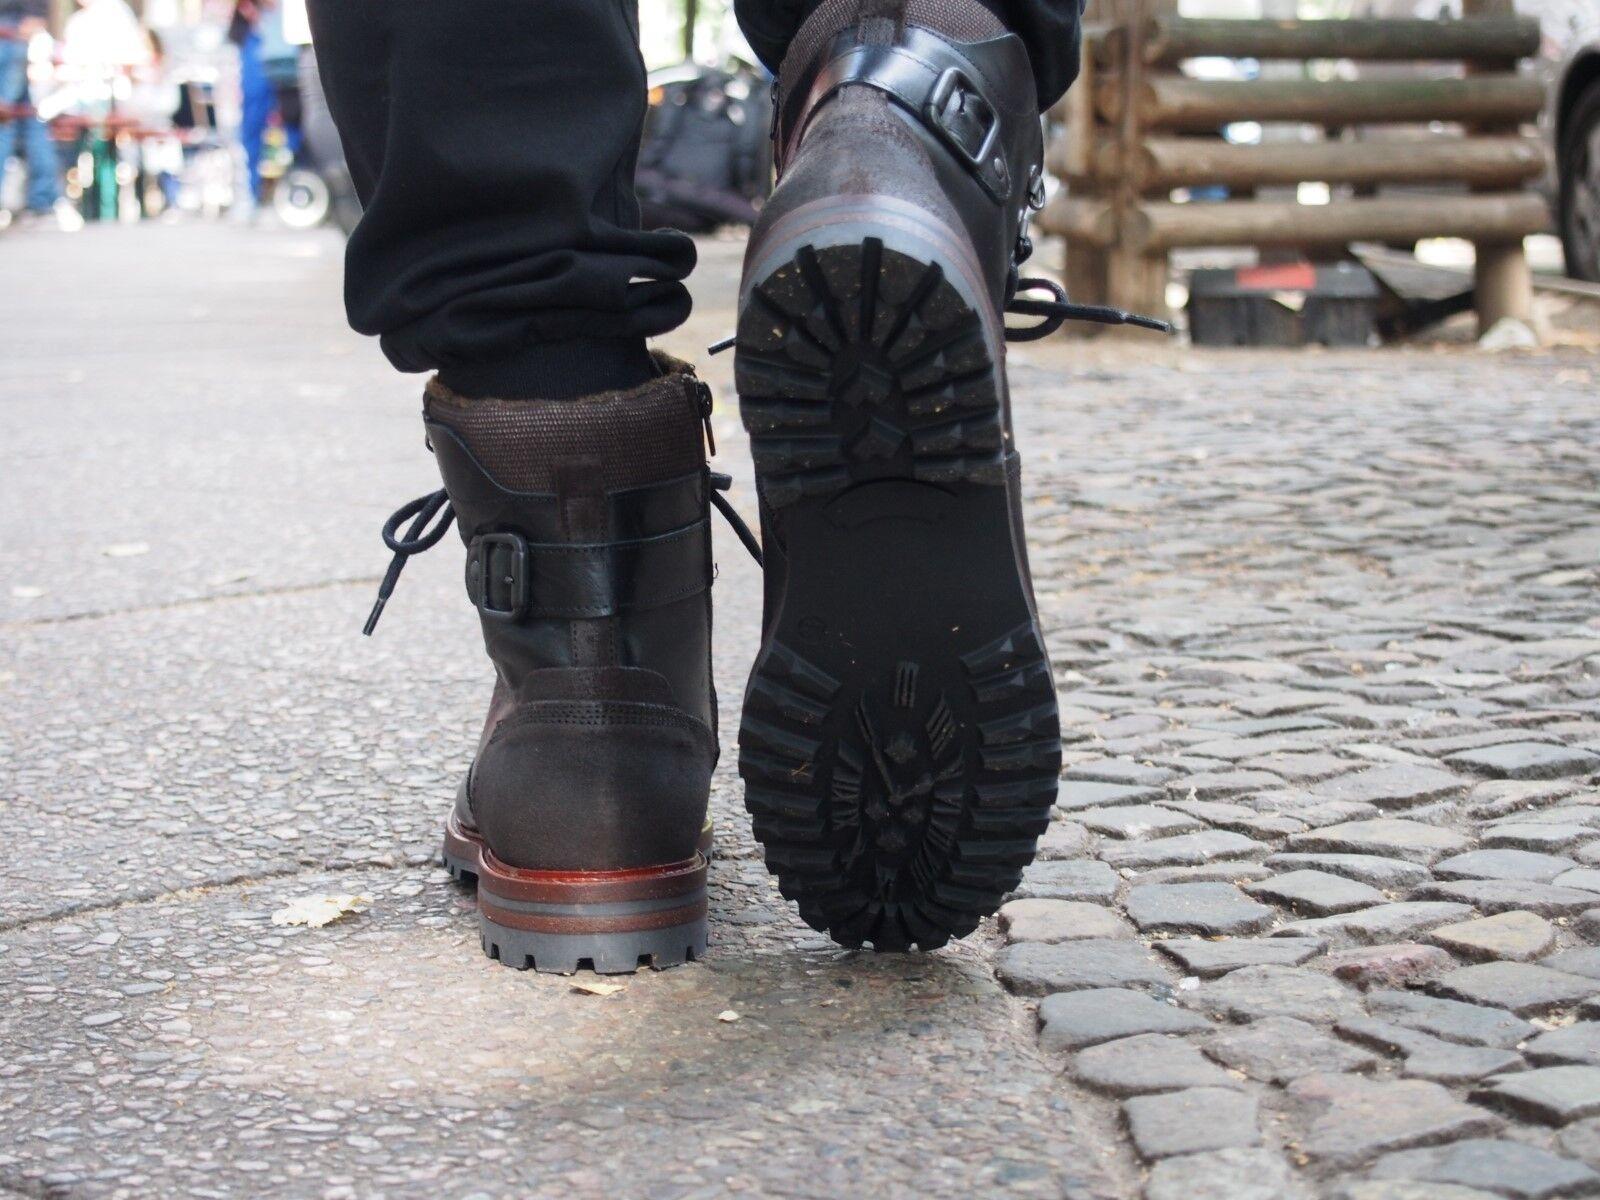 Nike Zoom Huarache 2 Laf Schuhe Schwarz Gelb 469850 007